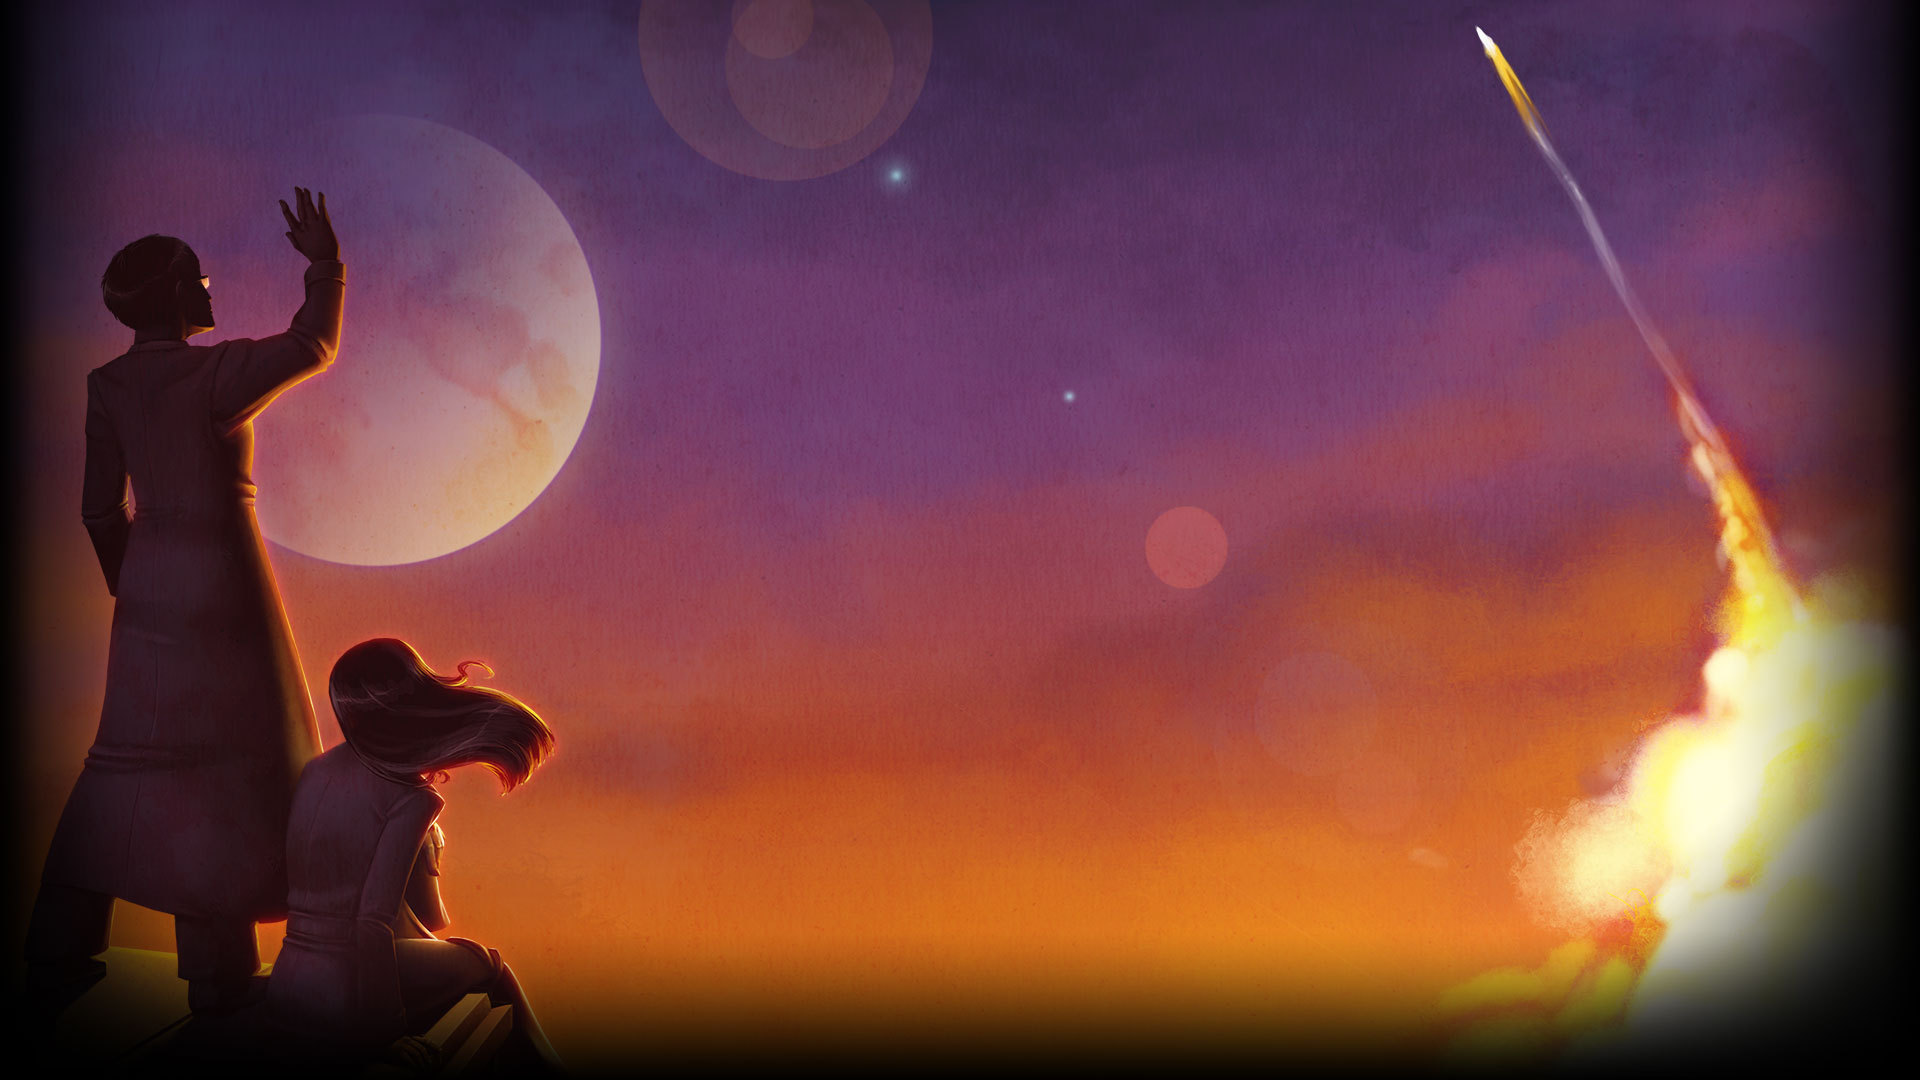 تریلر-بازی-To-The-Moon-روی-سوئیچ